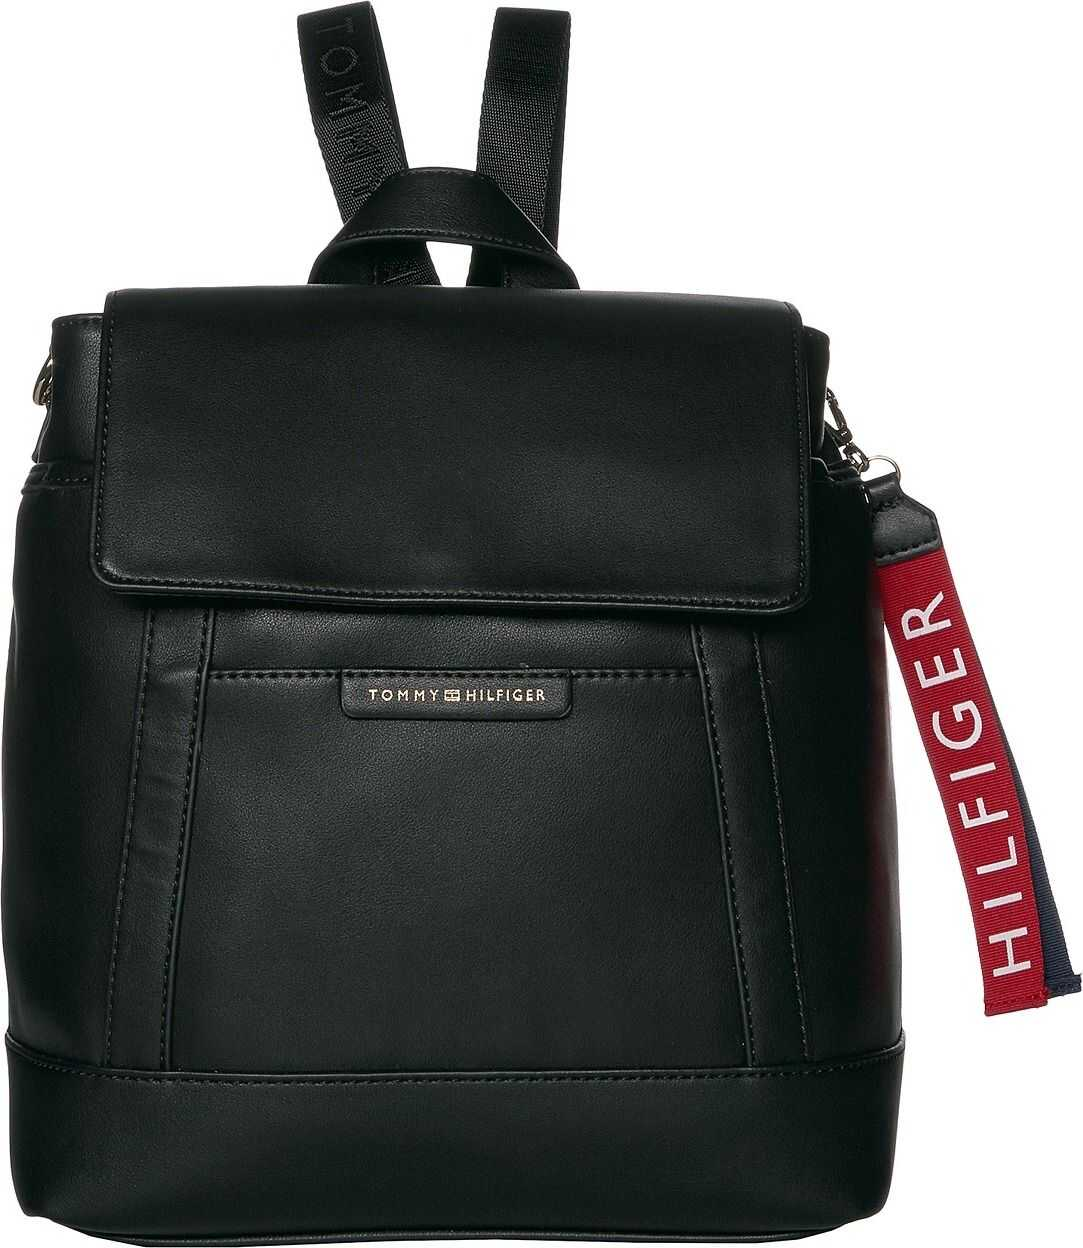 Tommy Hilfiger Lottie Smooth PVC Backpack Black